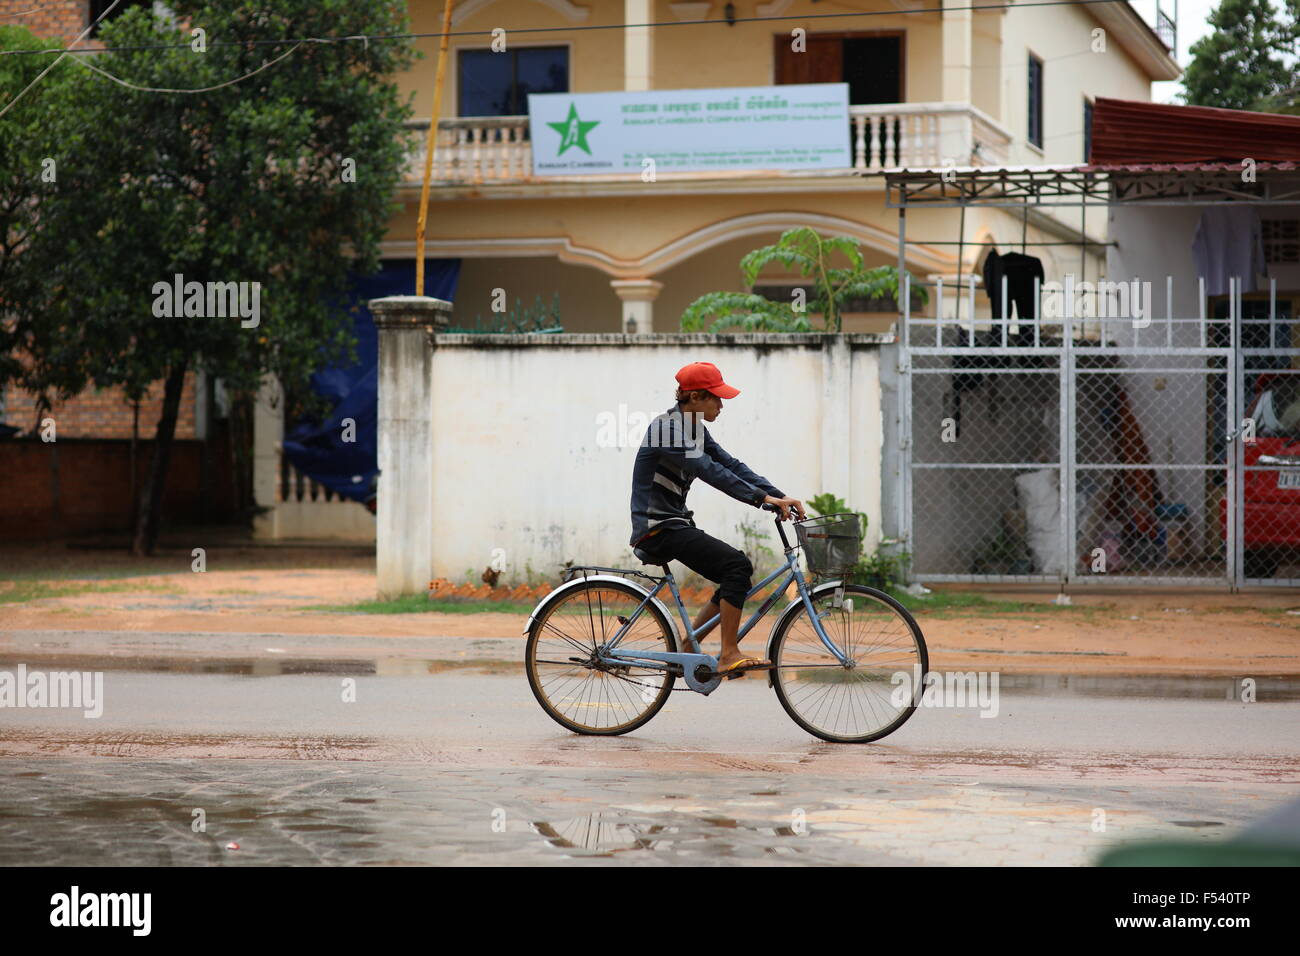 asian-boy-on-bicycle-in-rain-F540TP.jpg